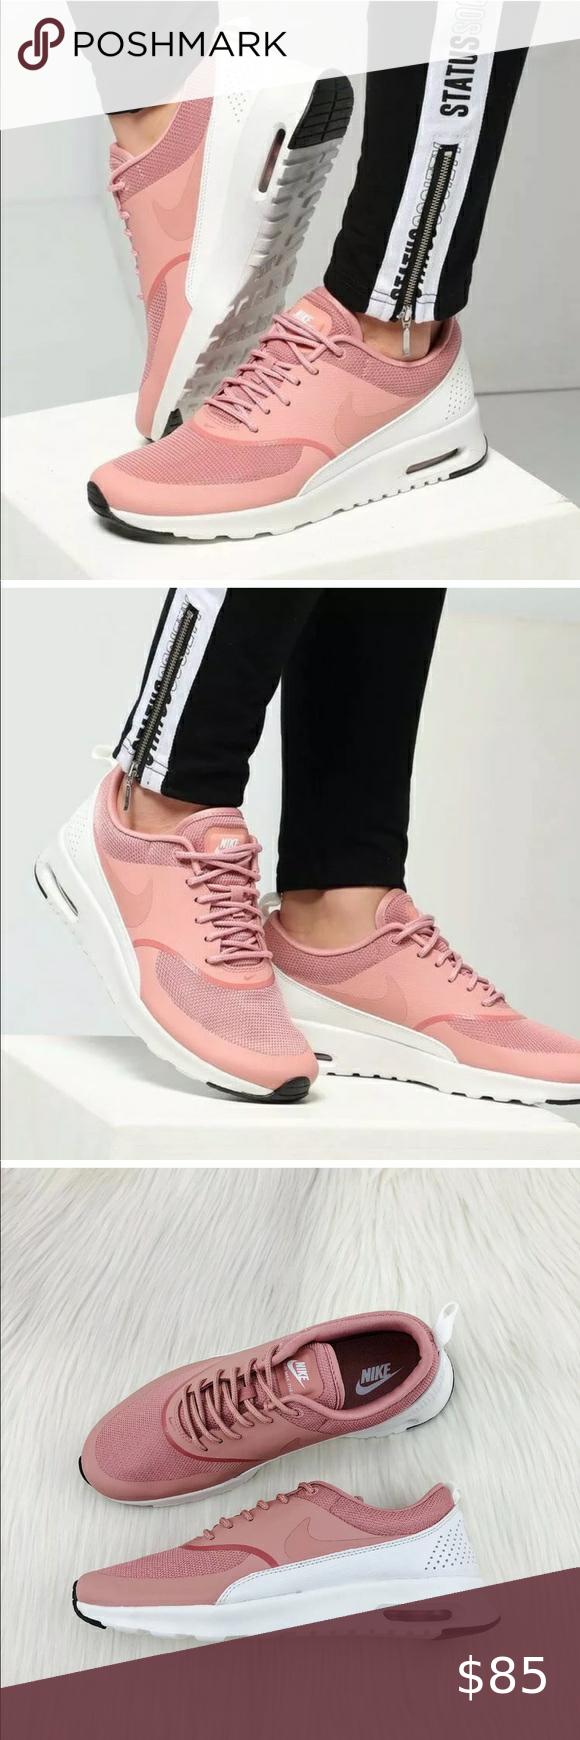 Women's Nike Air Max Thea Rust Pink Sneakers Women's Nike